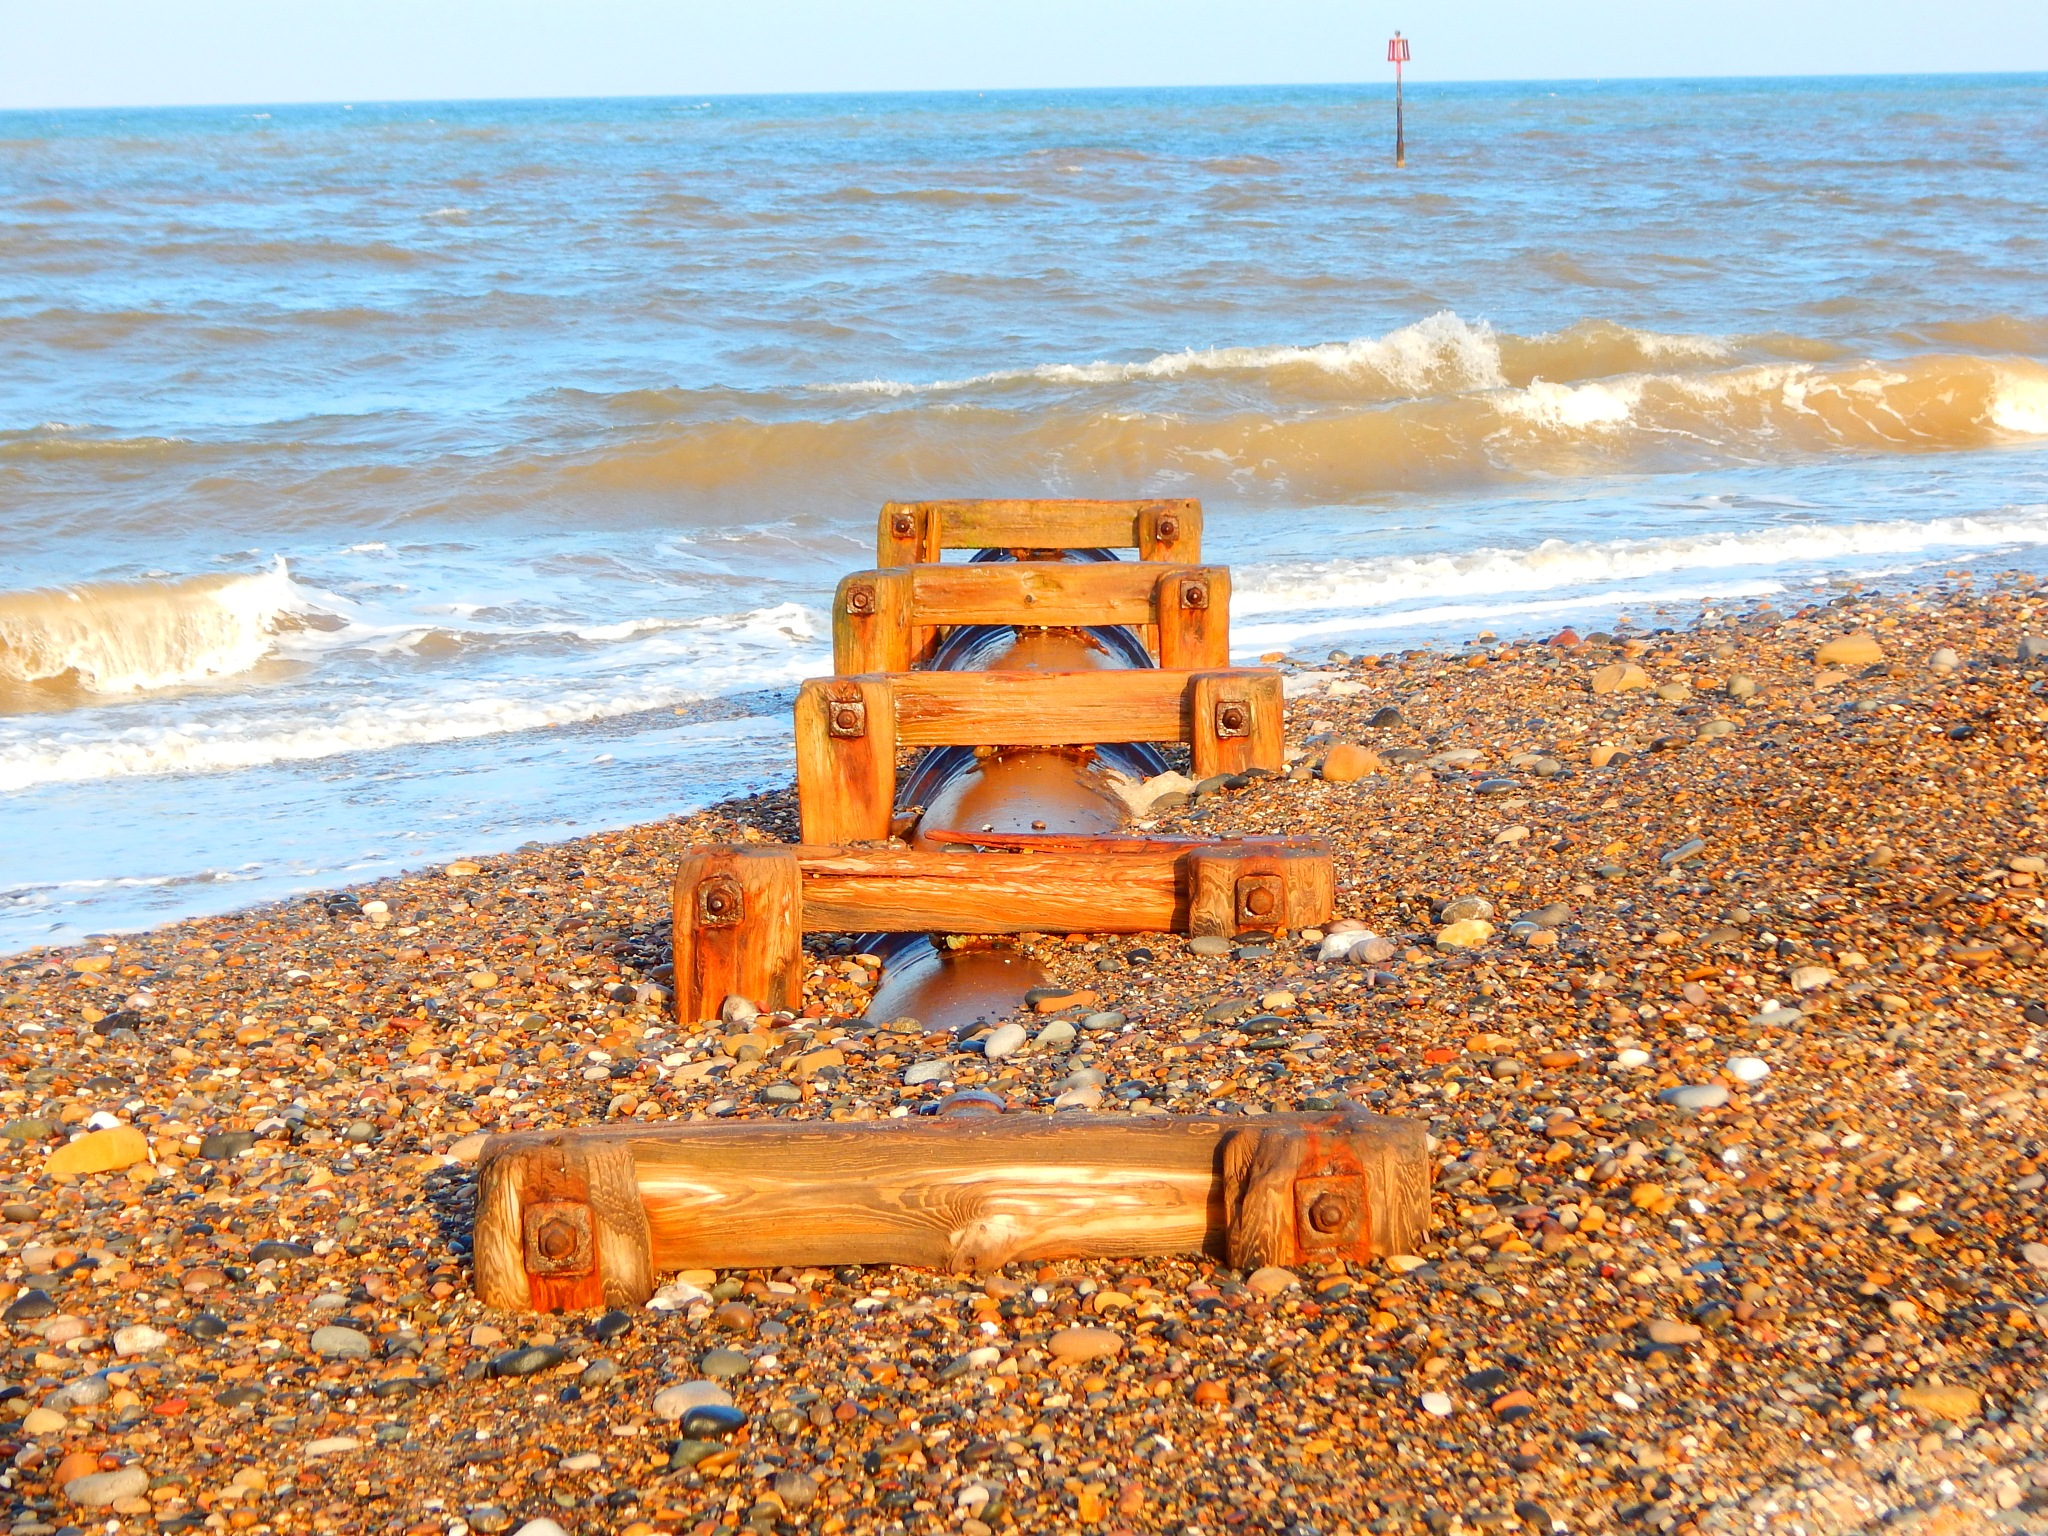 Beach sea.sand by tripplexxx05